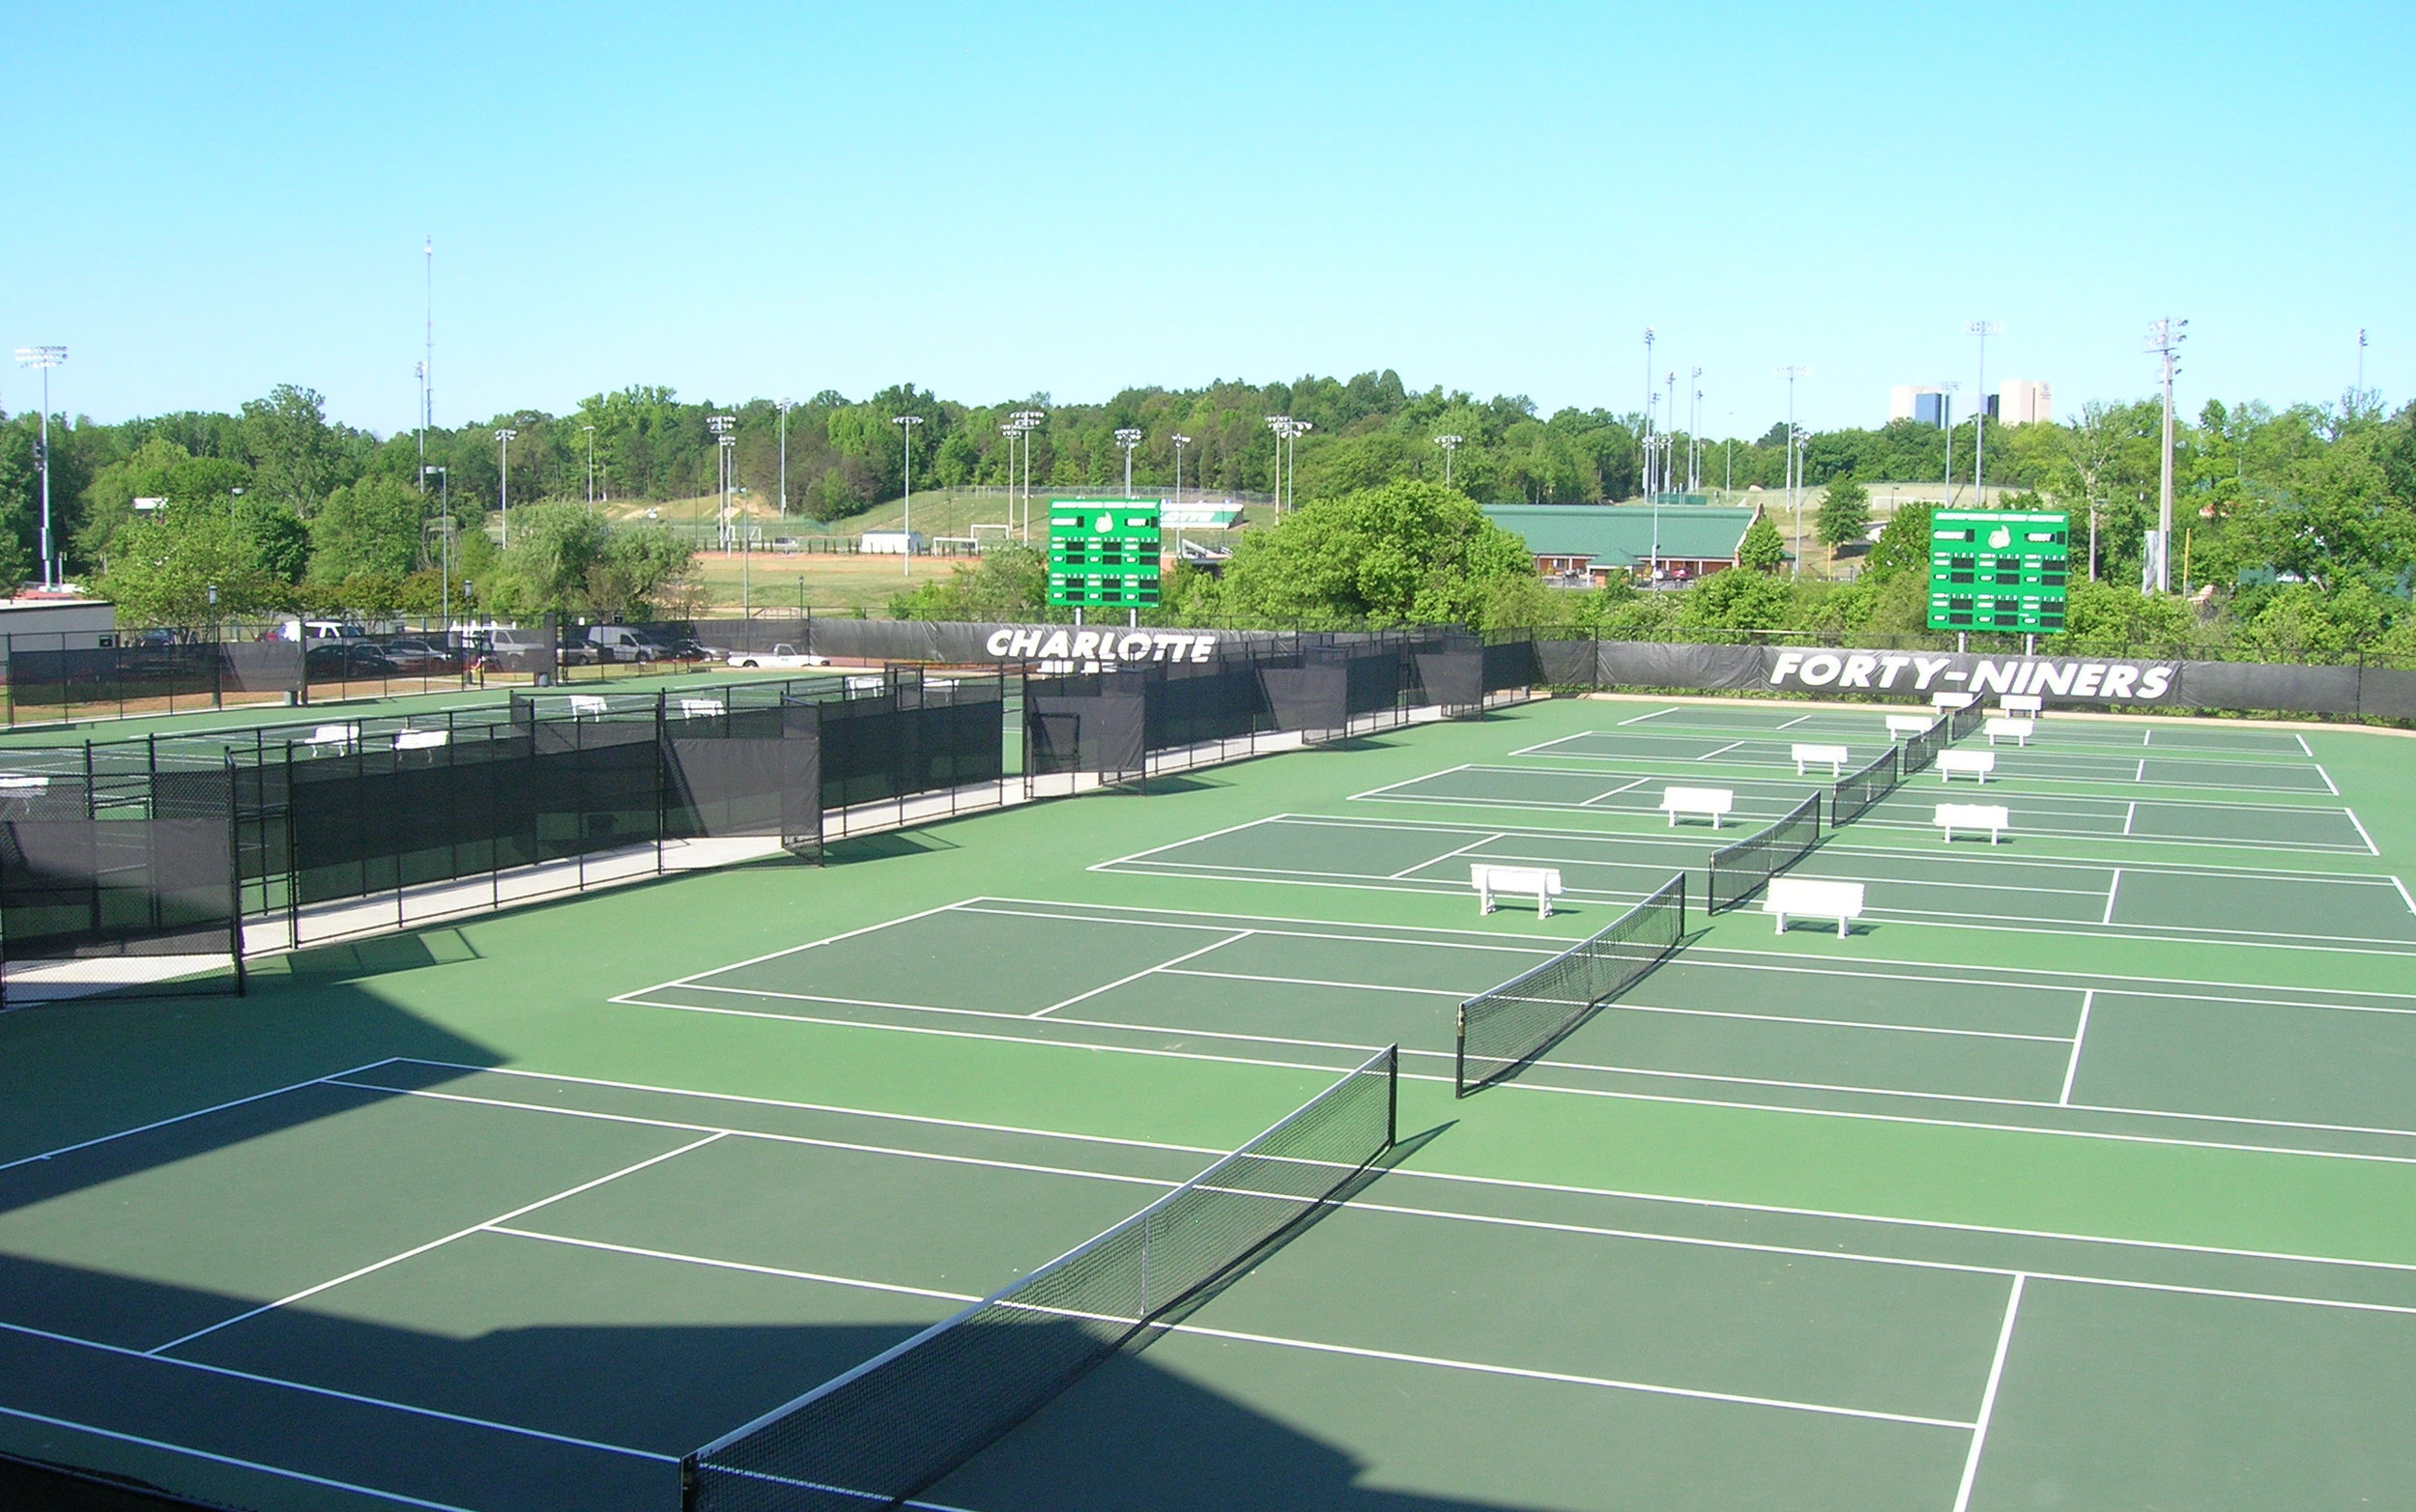 ADW-Higher-Education-UNC-Charlotte-NC-Tennis-Courts.jpg